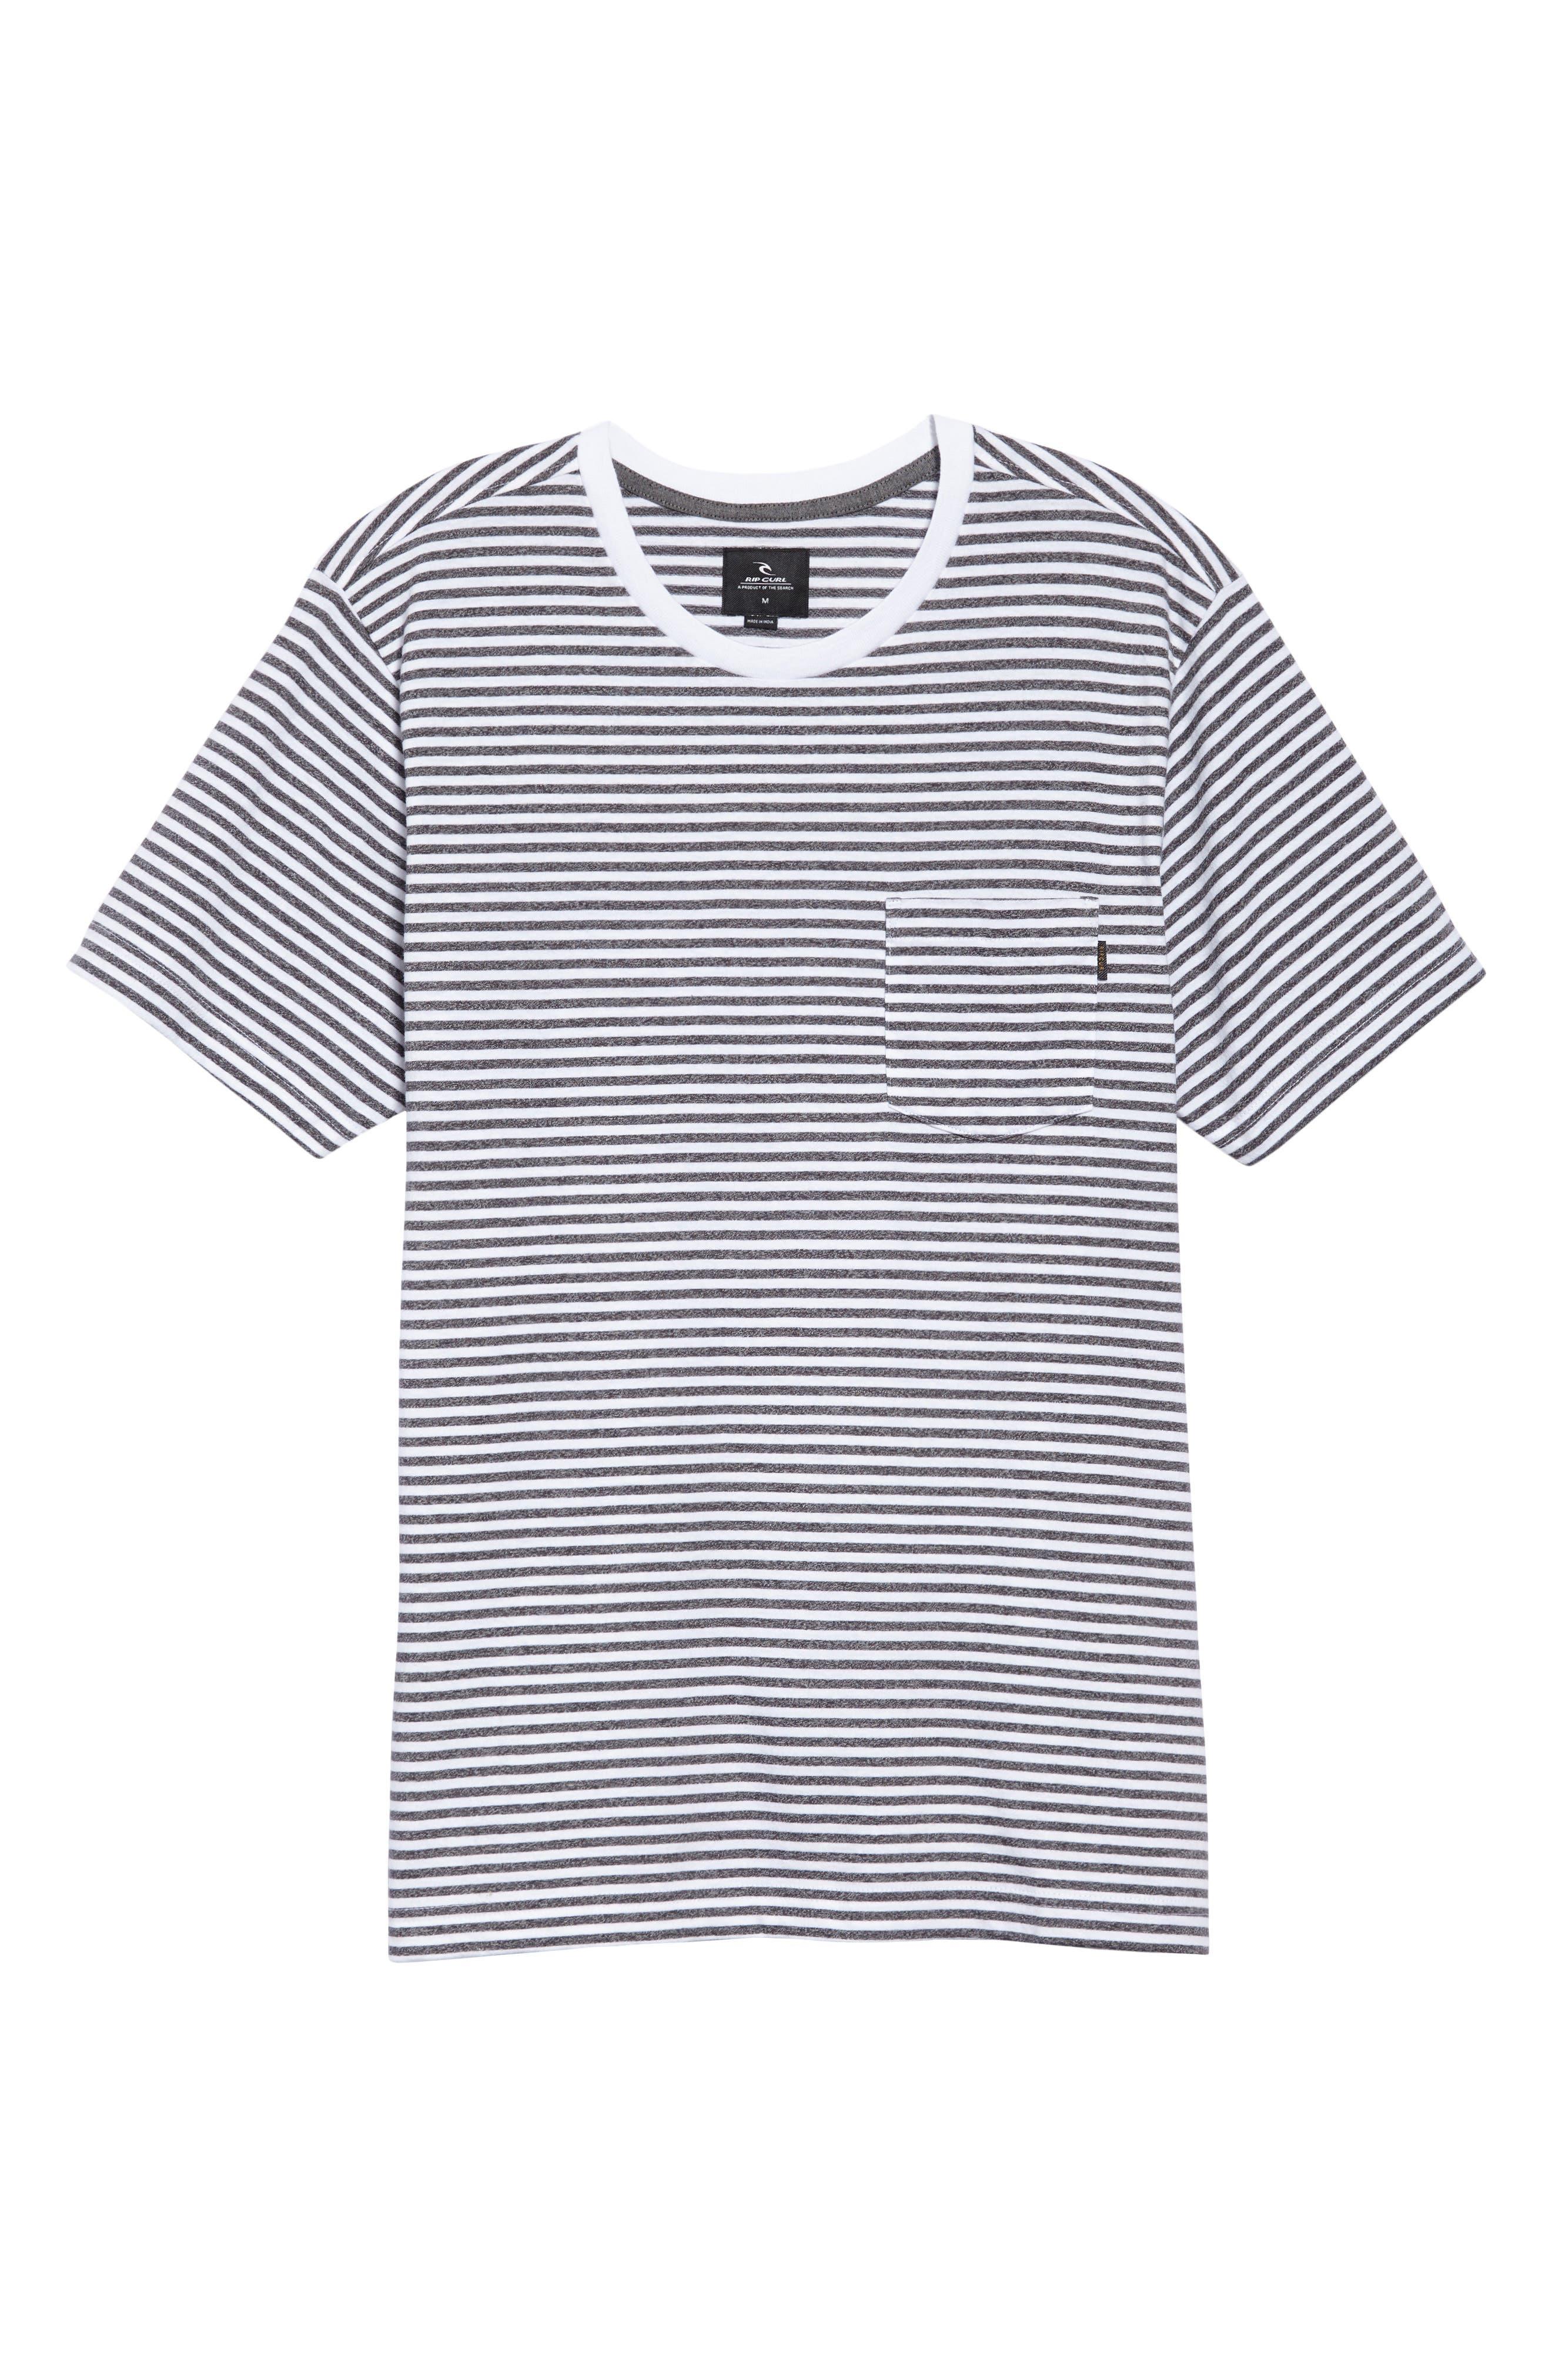 Prospect T-Shirt,                             Alternate thumbnail 18, color,